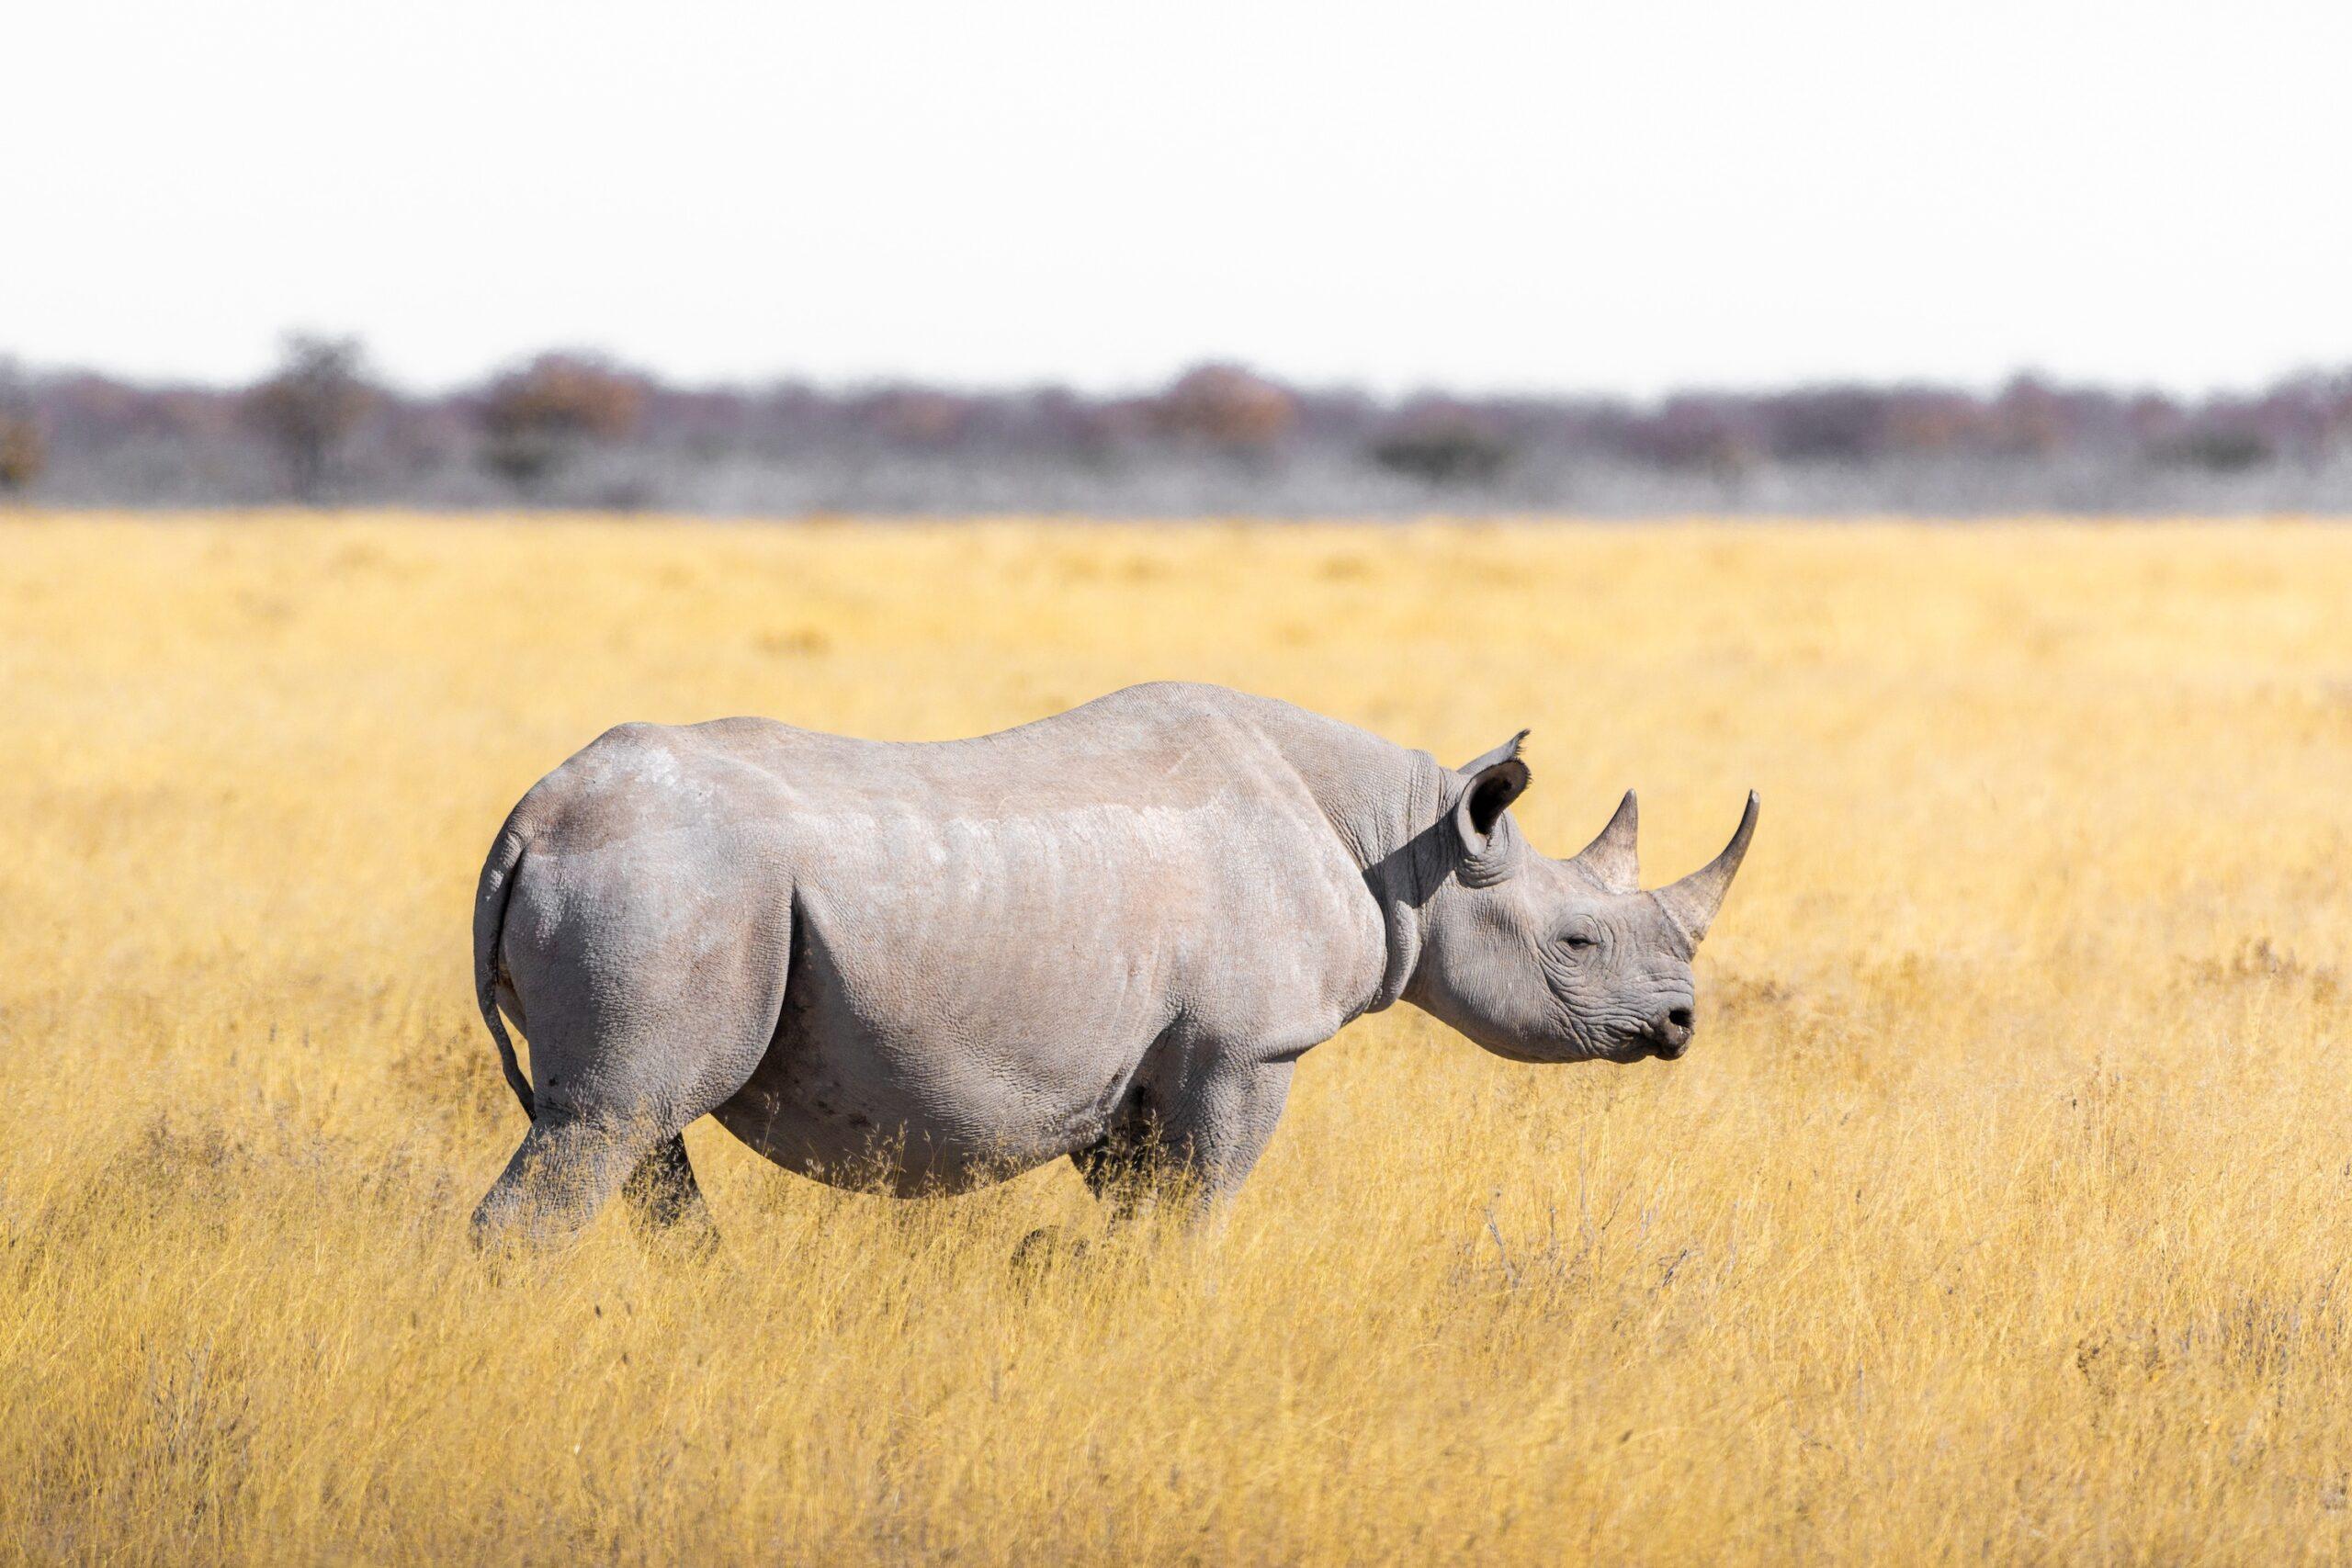 A white rhino walking across savanna grassland